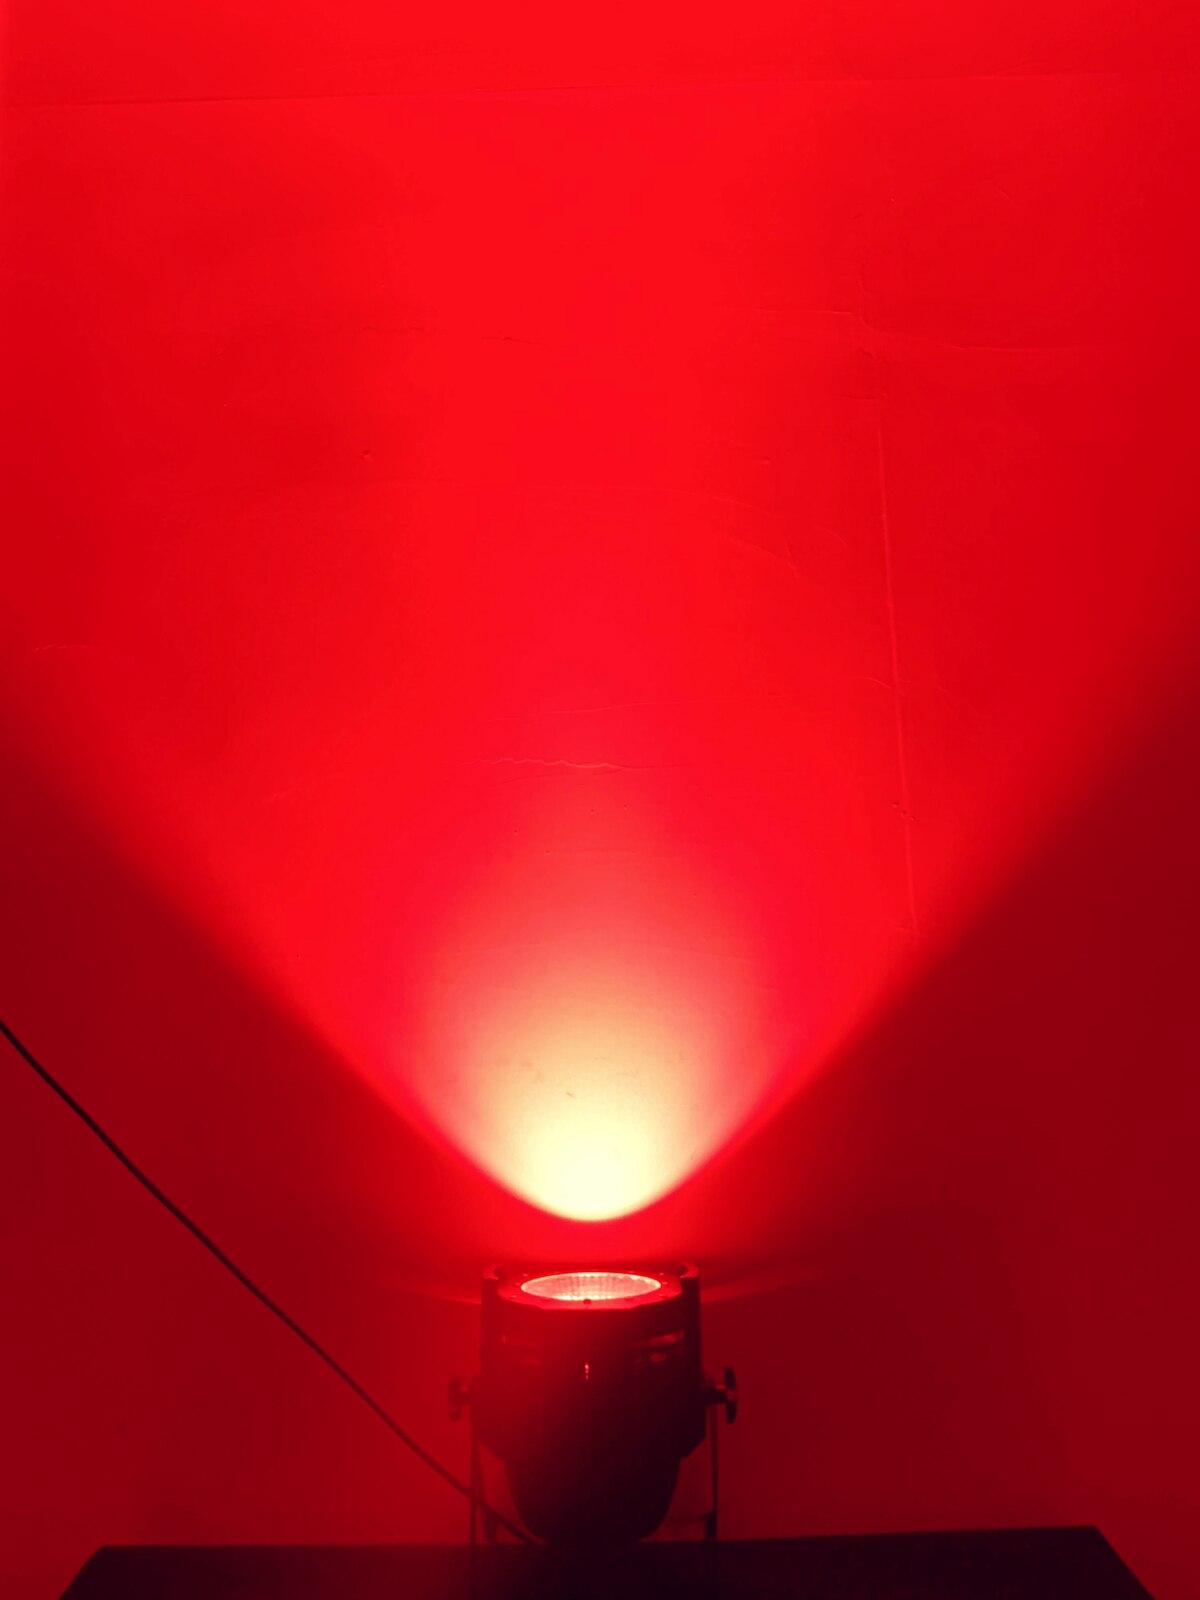 LED par 200W COB RGBWA UV 5in1/RGBW 4in1/RGB 3in1/ Warm White Cold white UV LED Par Par64 led spotlight dj light - 2